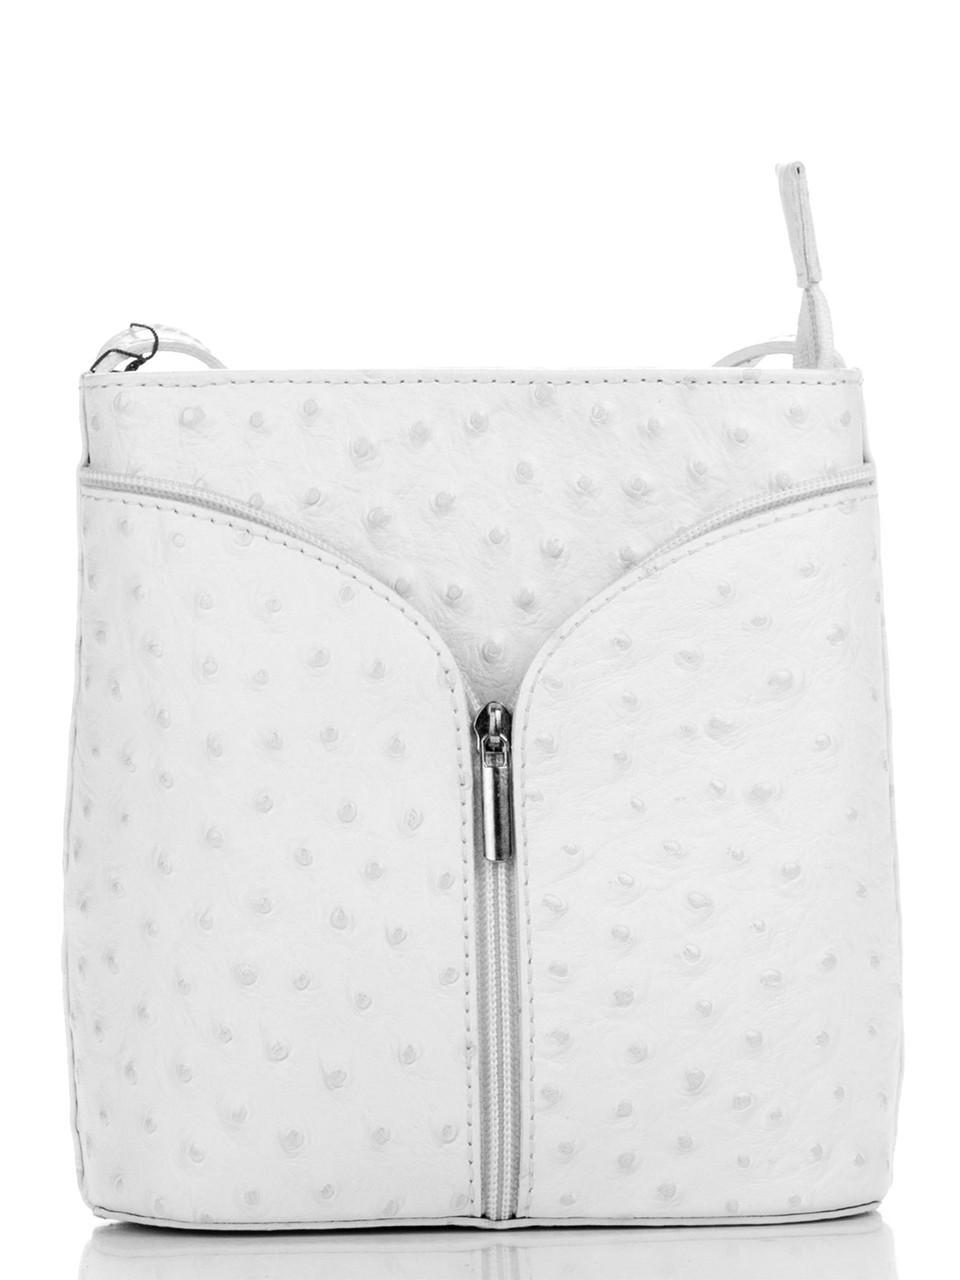 Diva's Bag Женская кожаная сумка KYRA цвет белый